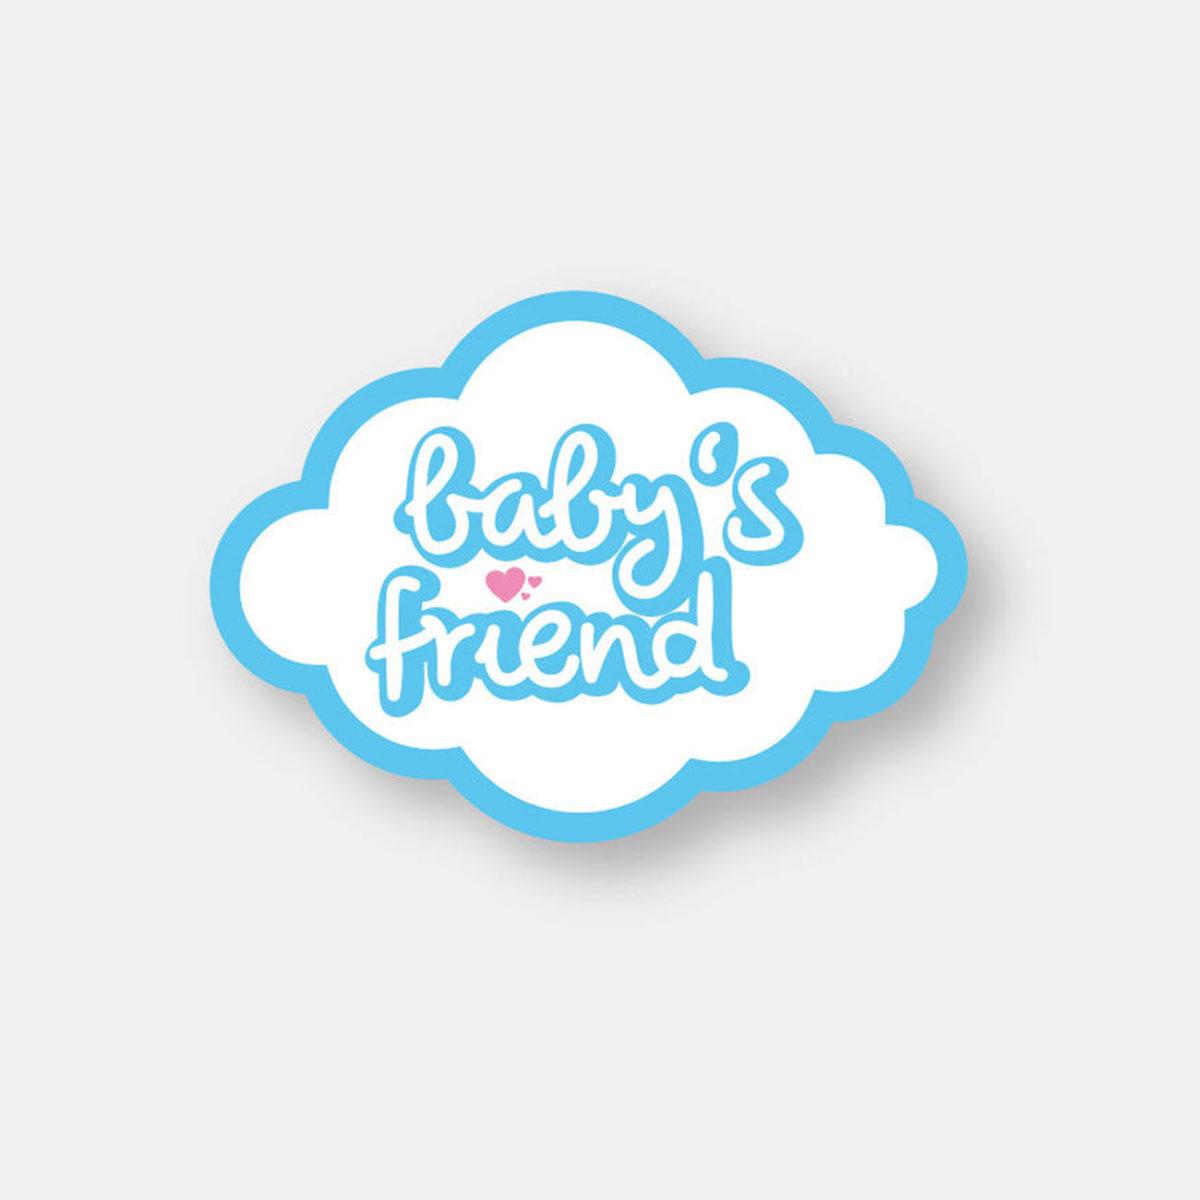 goldnbold_logodesign_babysfriend